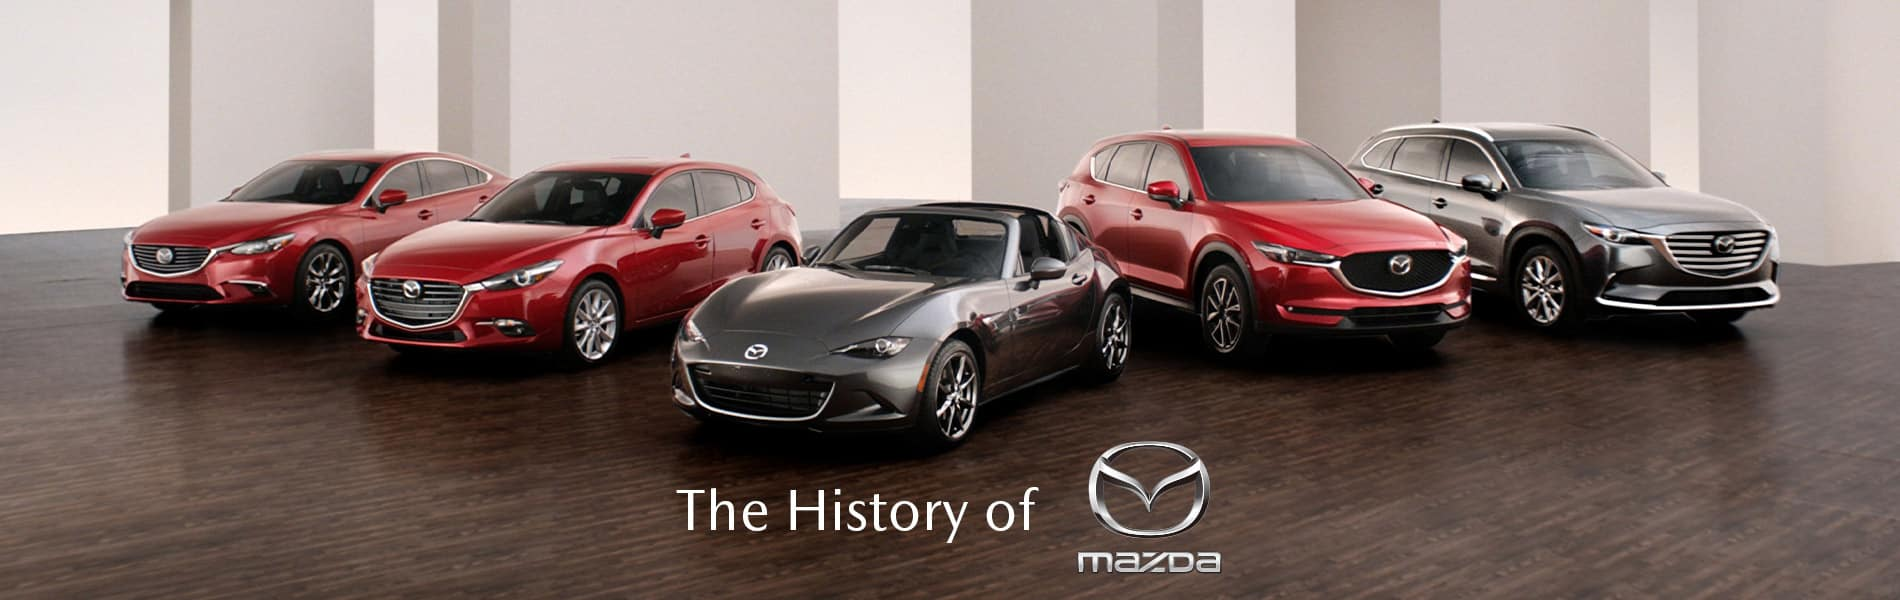 The History of Mazda - Mazda of Bedford - Bedford, OH